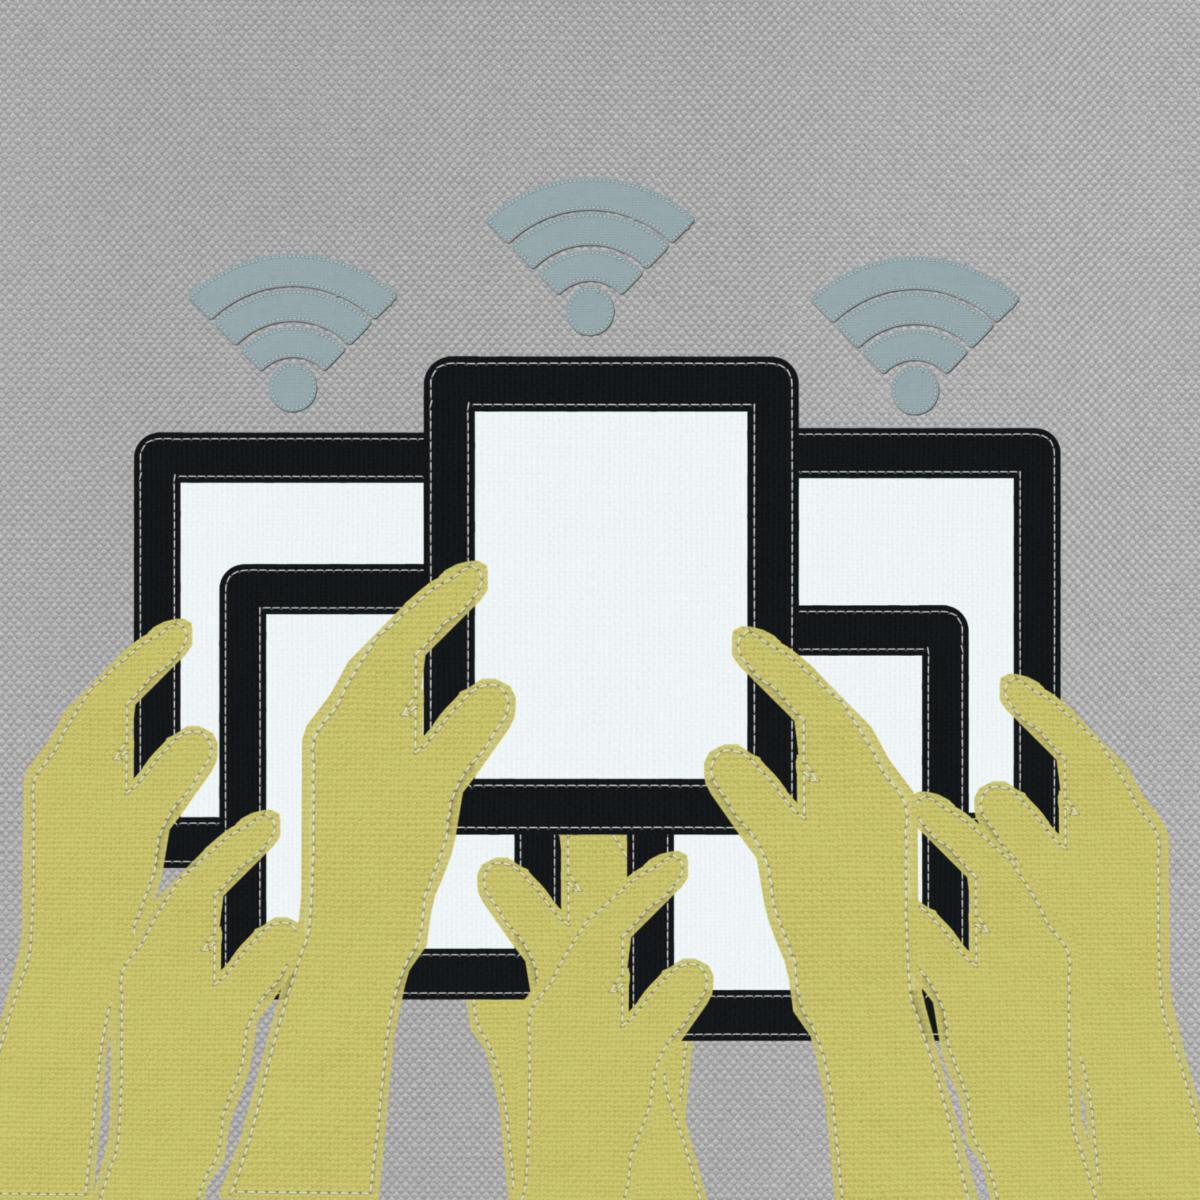 Apple Cisco partnership iPhone iPad BYOD mobility networking